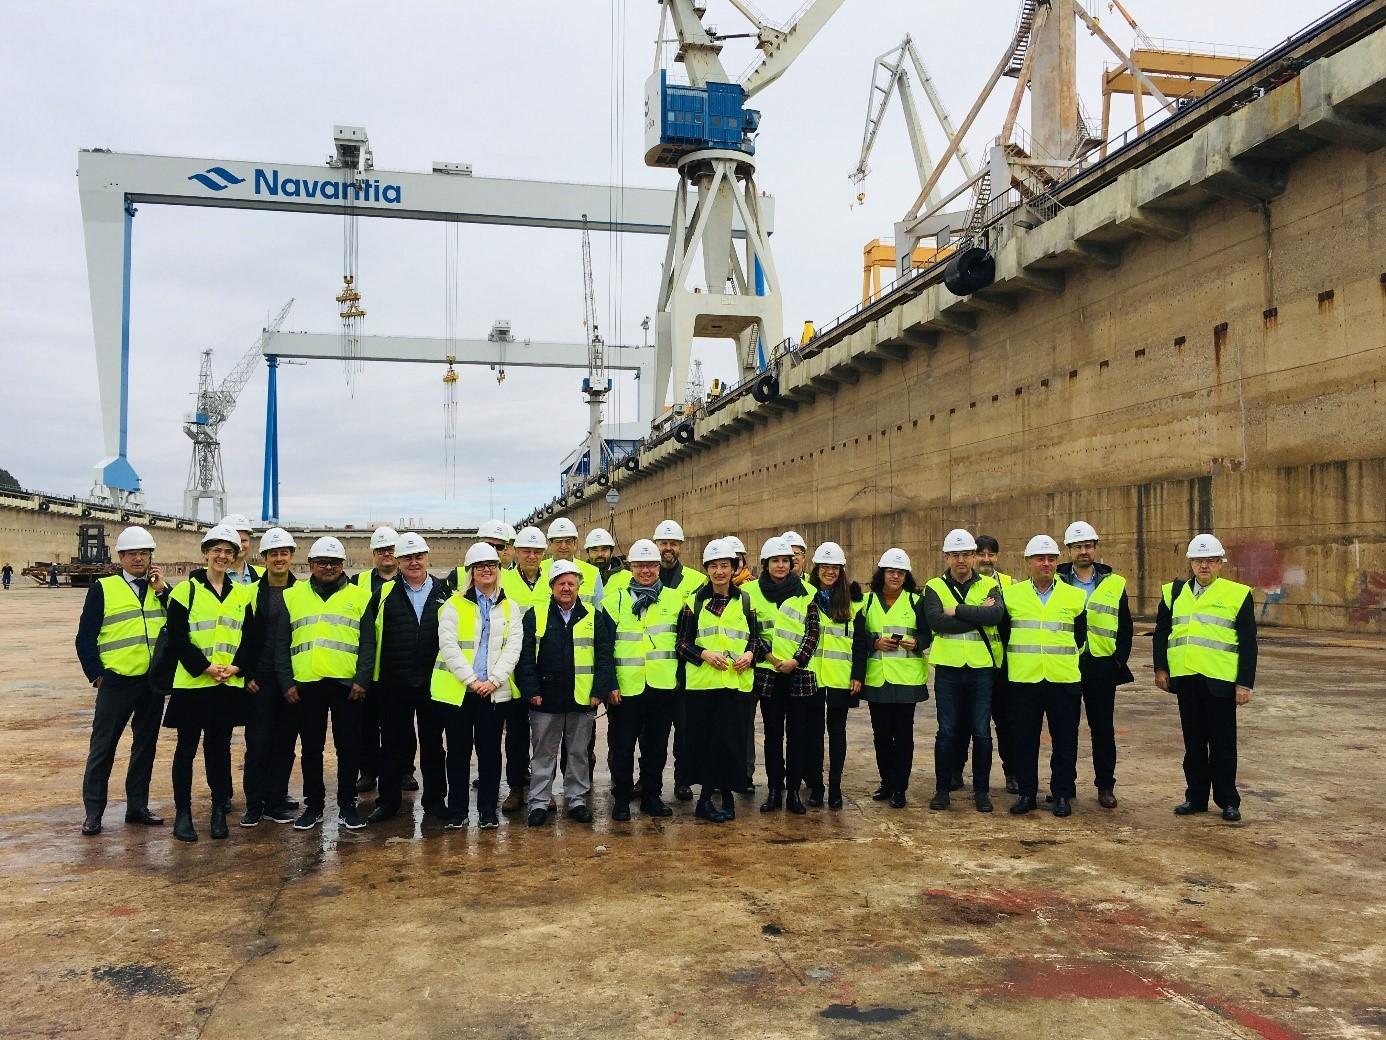 USWE visit to Navantia Shipyard